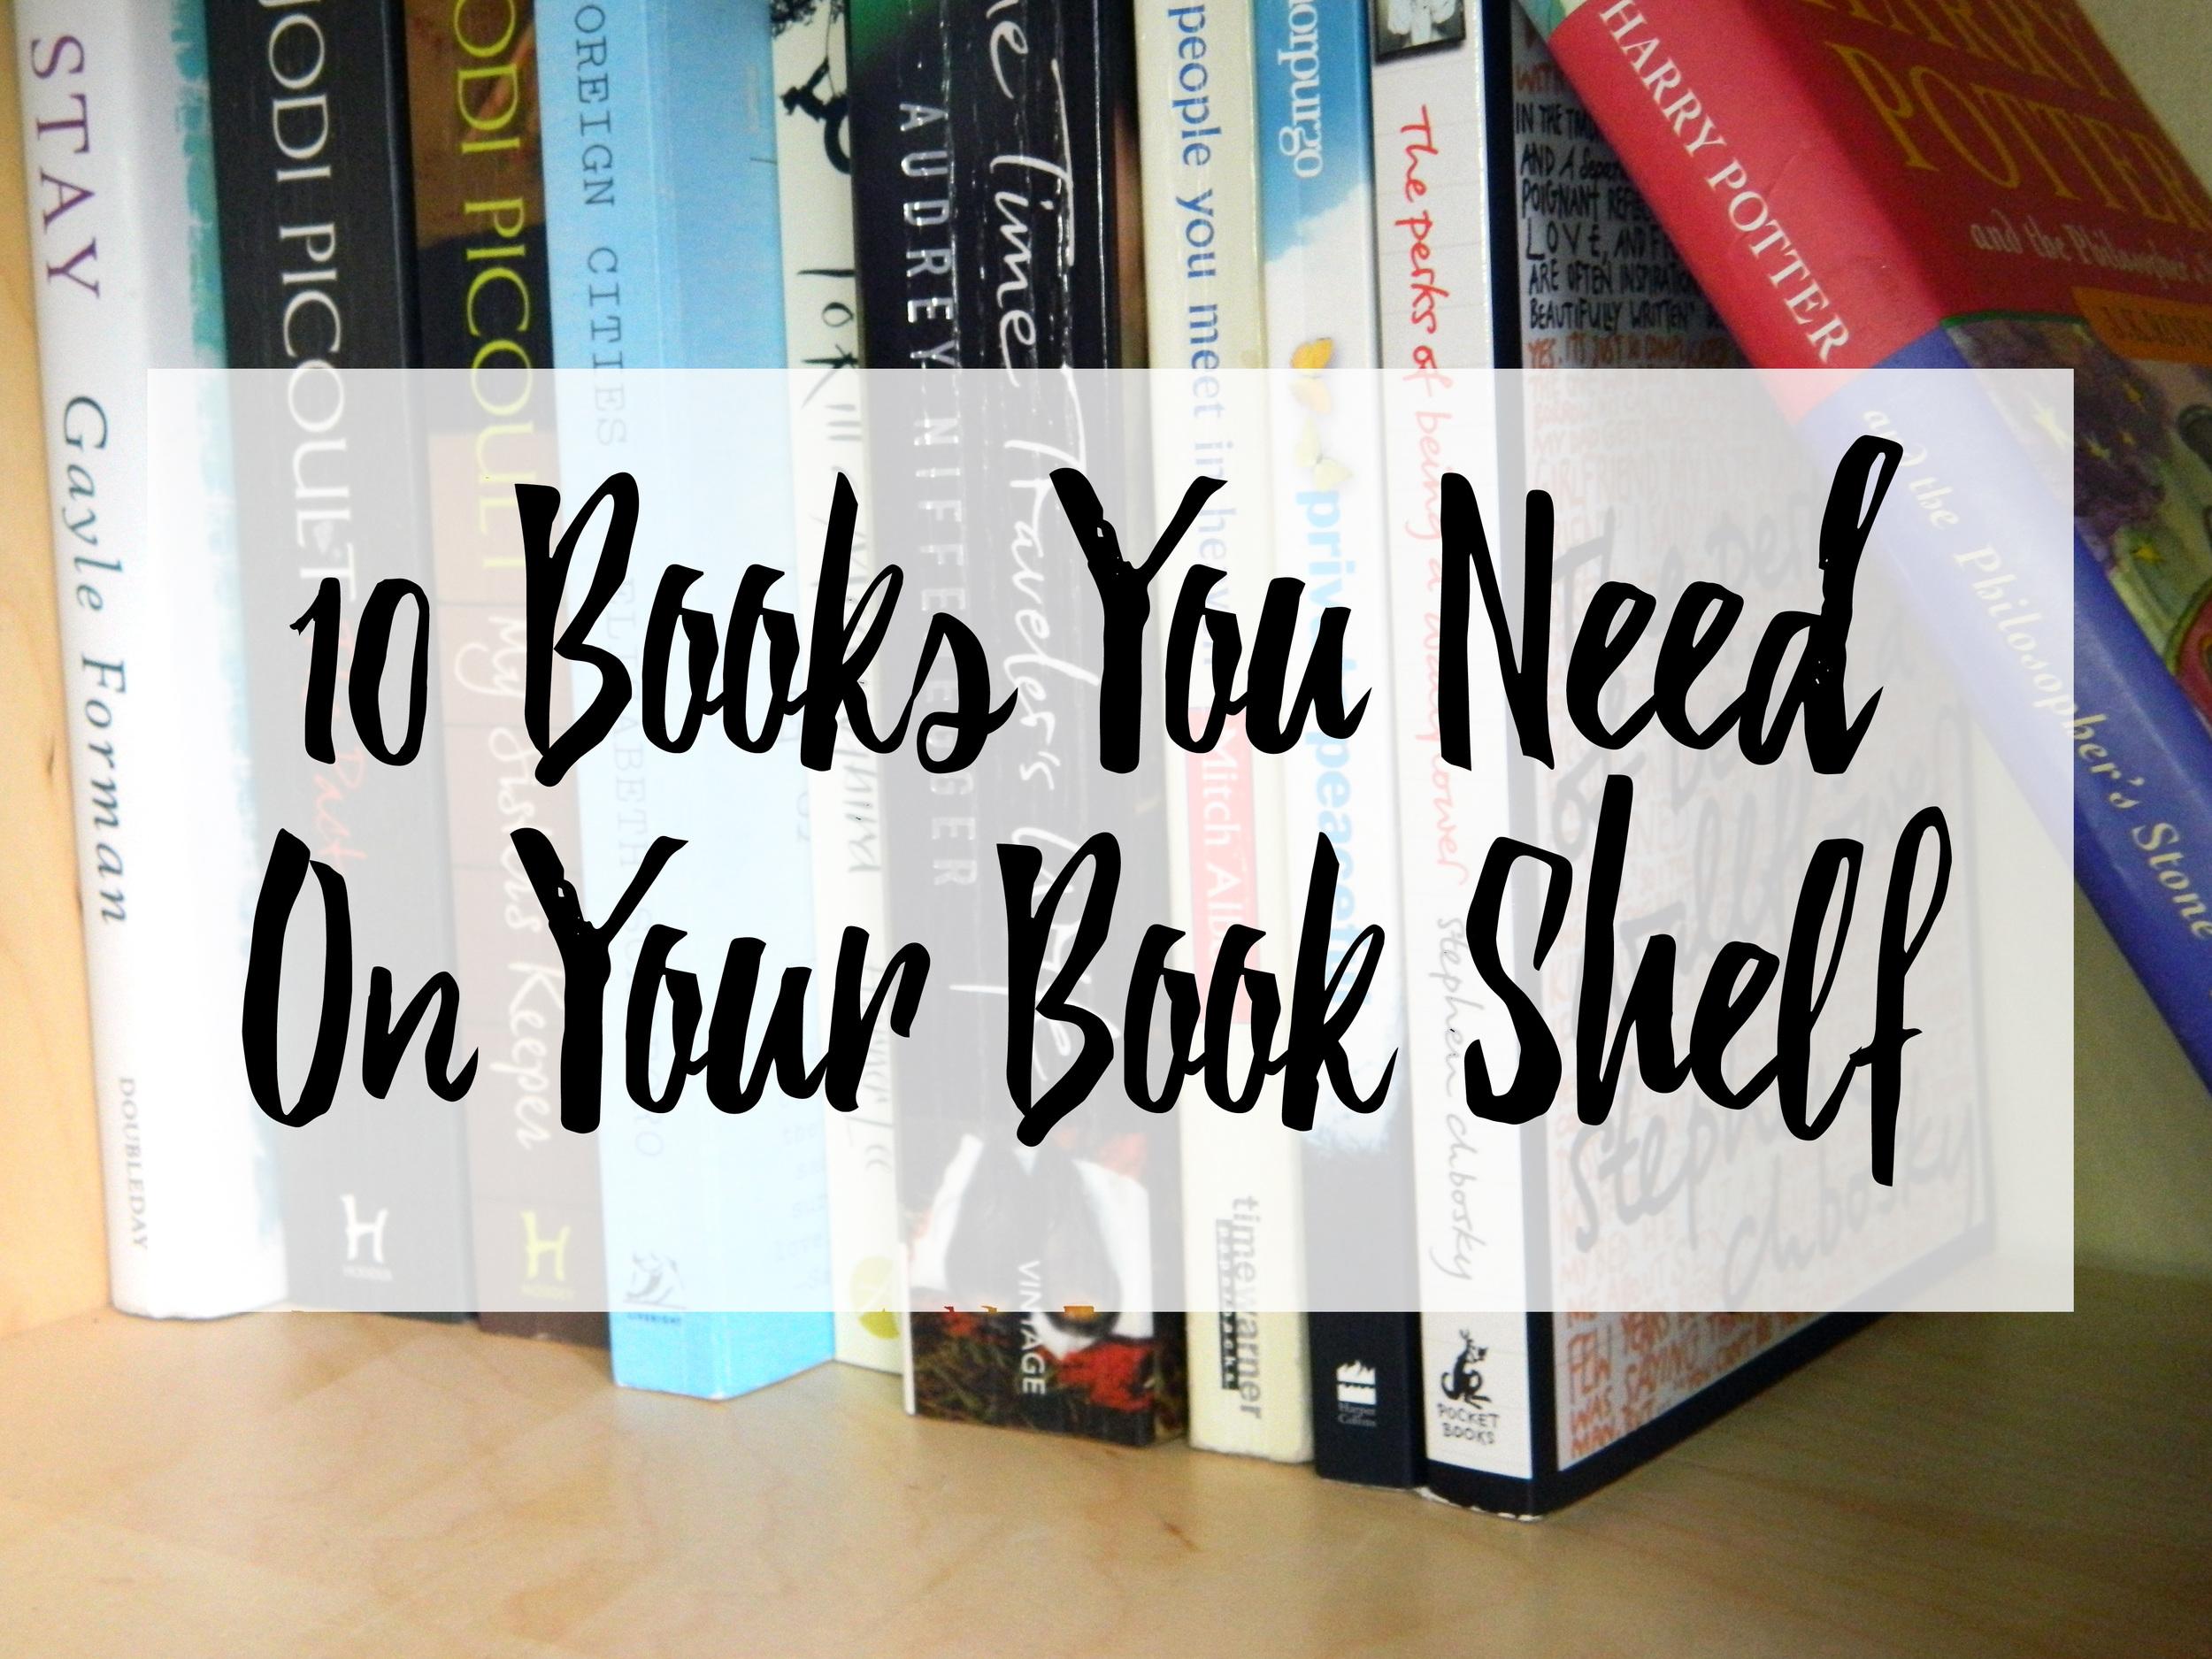 10 Books You Need On Your Book Shelf Promo Photo.